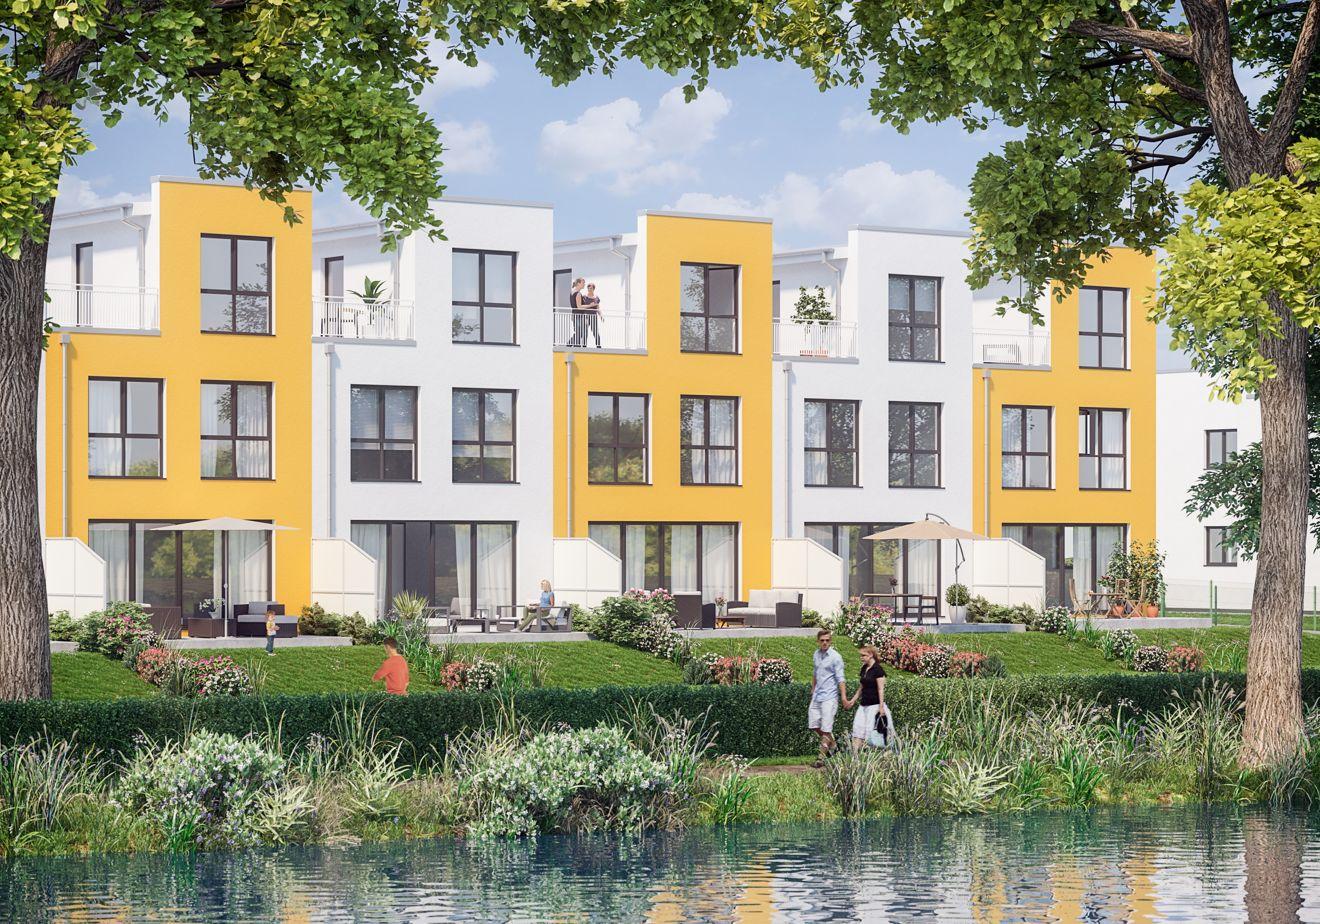 First Home baut exklusive Townhouses mit Wasserblick Foto: First Home Wohnbau GmbH